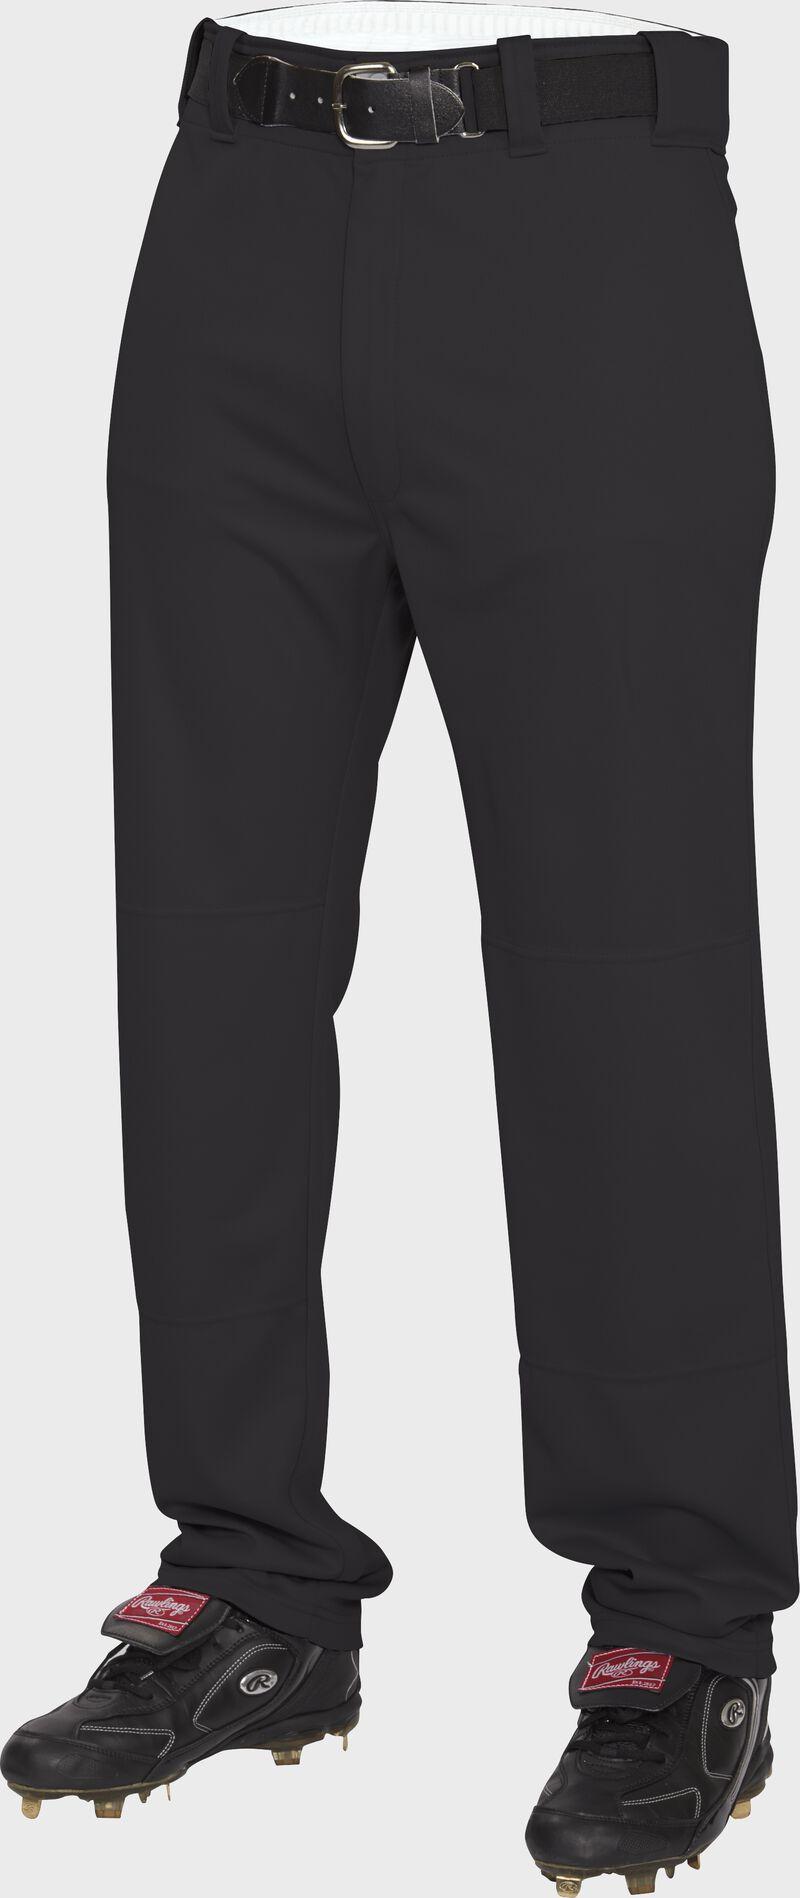 Front of Rawlings Black Adult Semi-Relaxed Pant - SKU #BP31SR